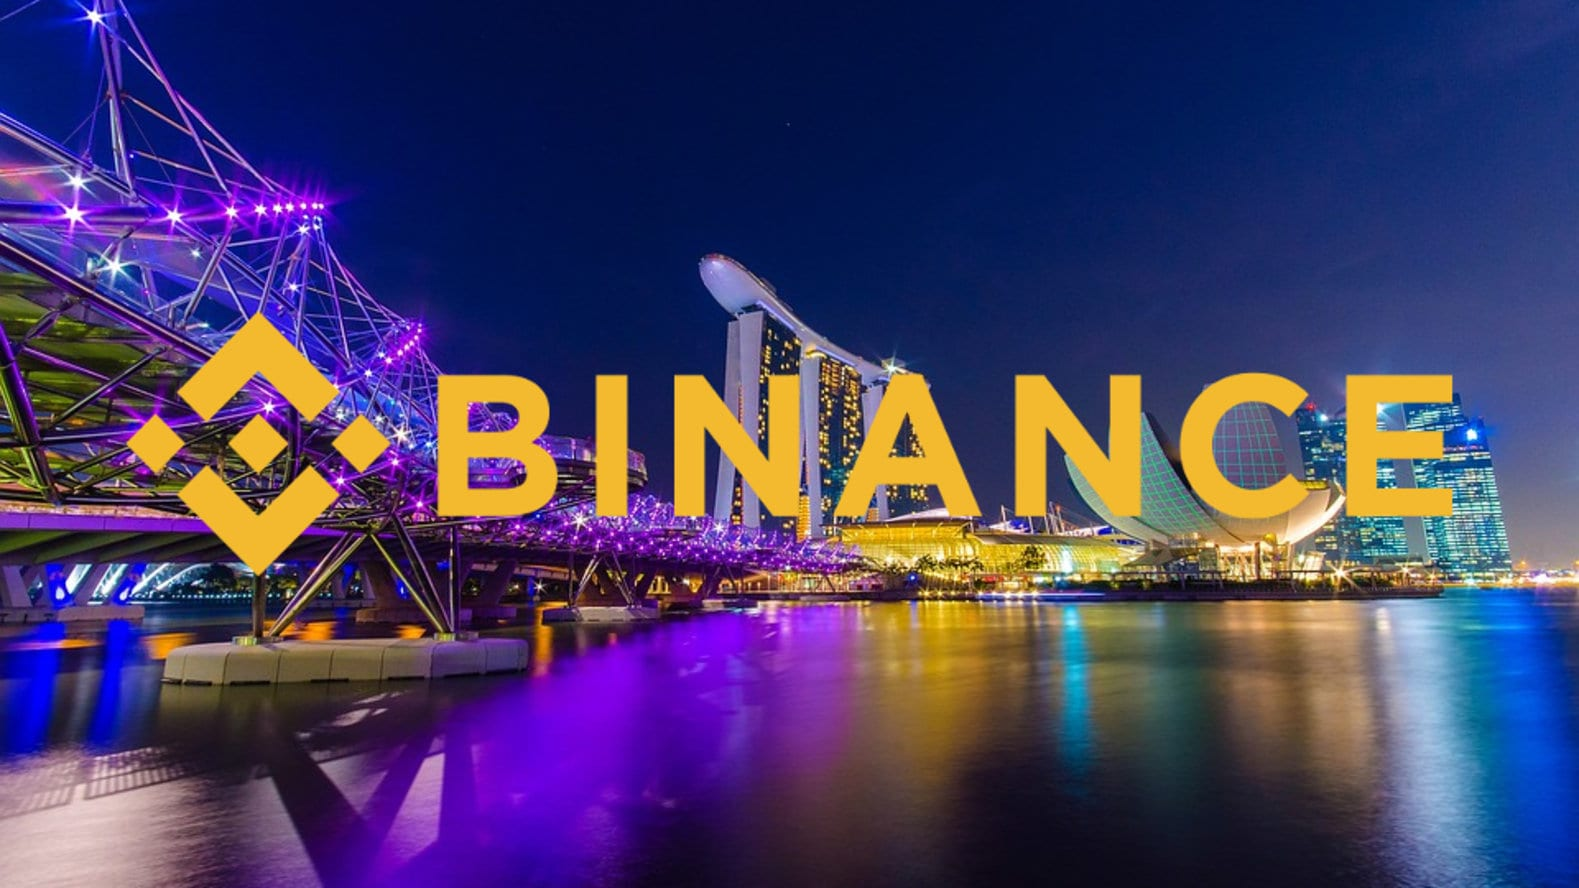 binance singapore2 - Crypto Adoption Intensifies: Binance Launches New Fiat Gateway In Singapore